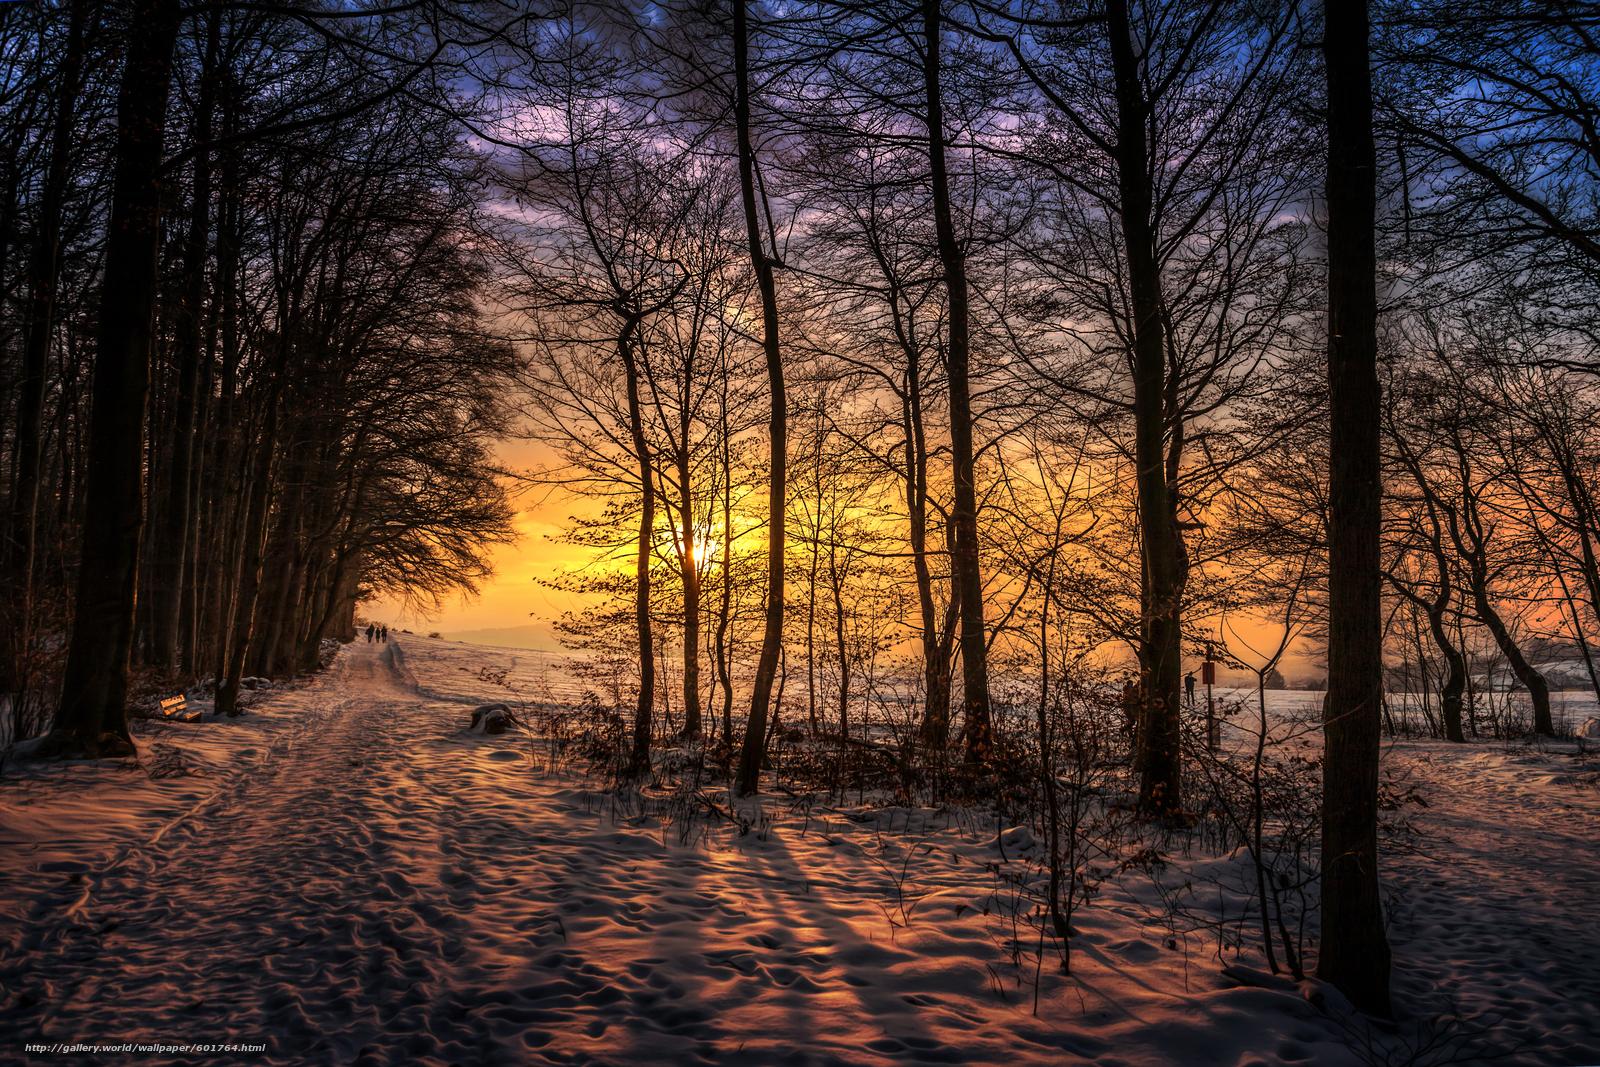 зима, закат, лес, деревья, дорога, солнце, снег, sunset walk, пейзаж